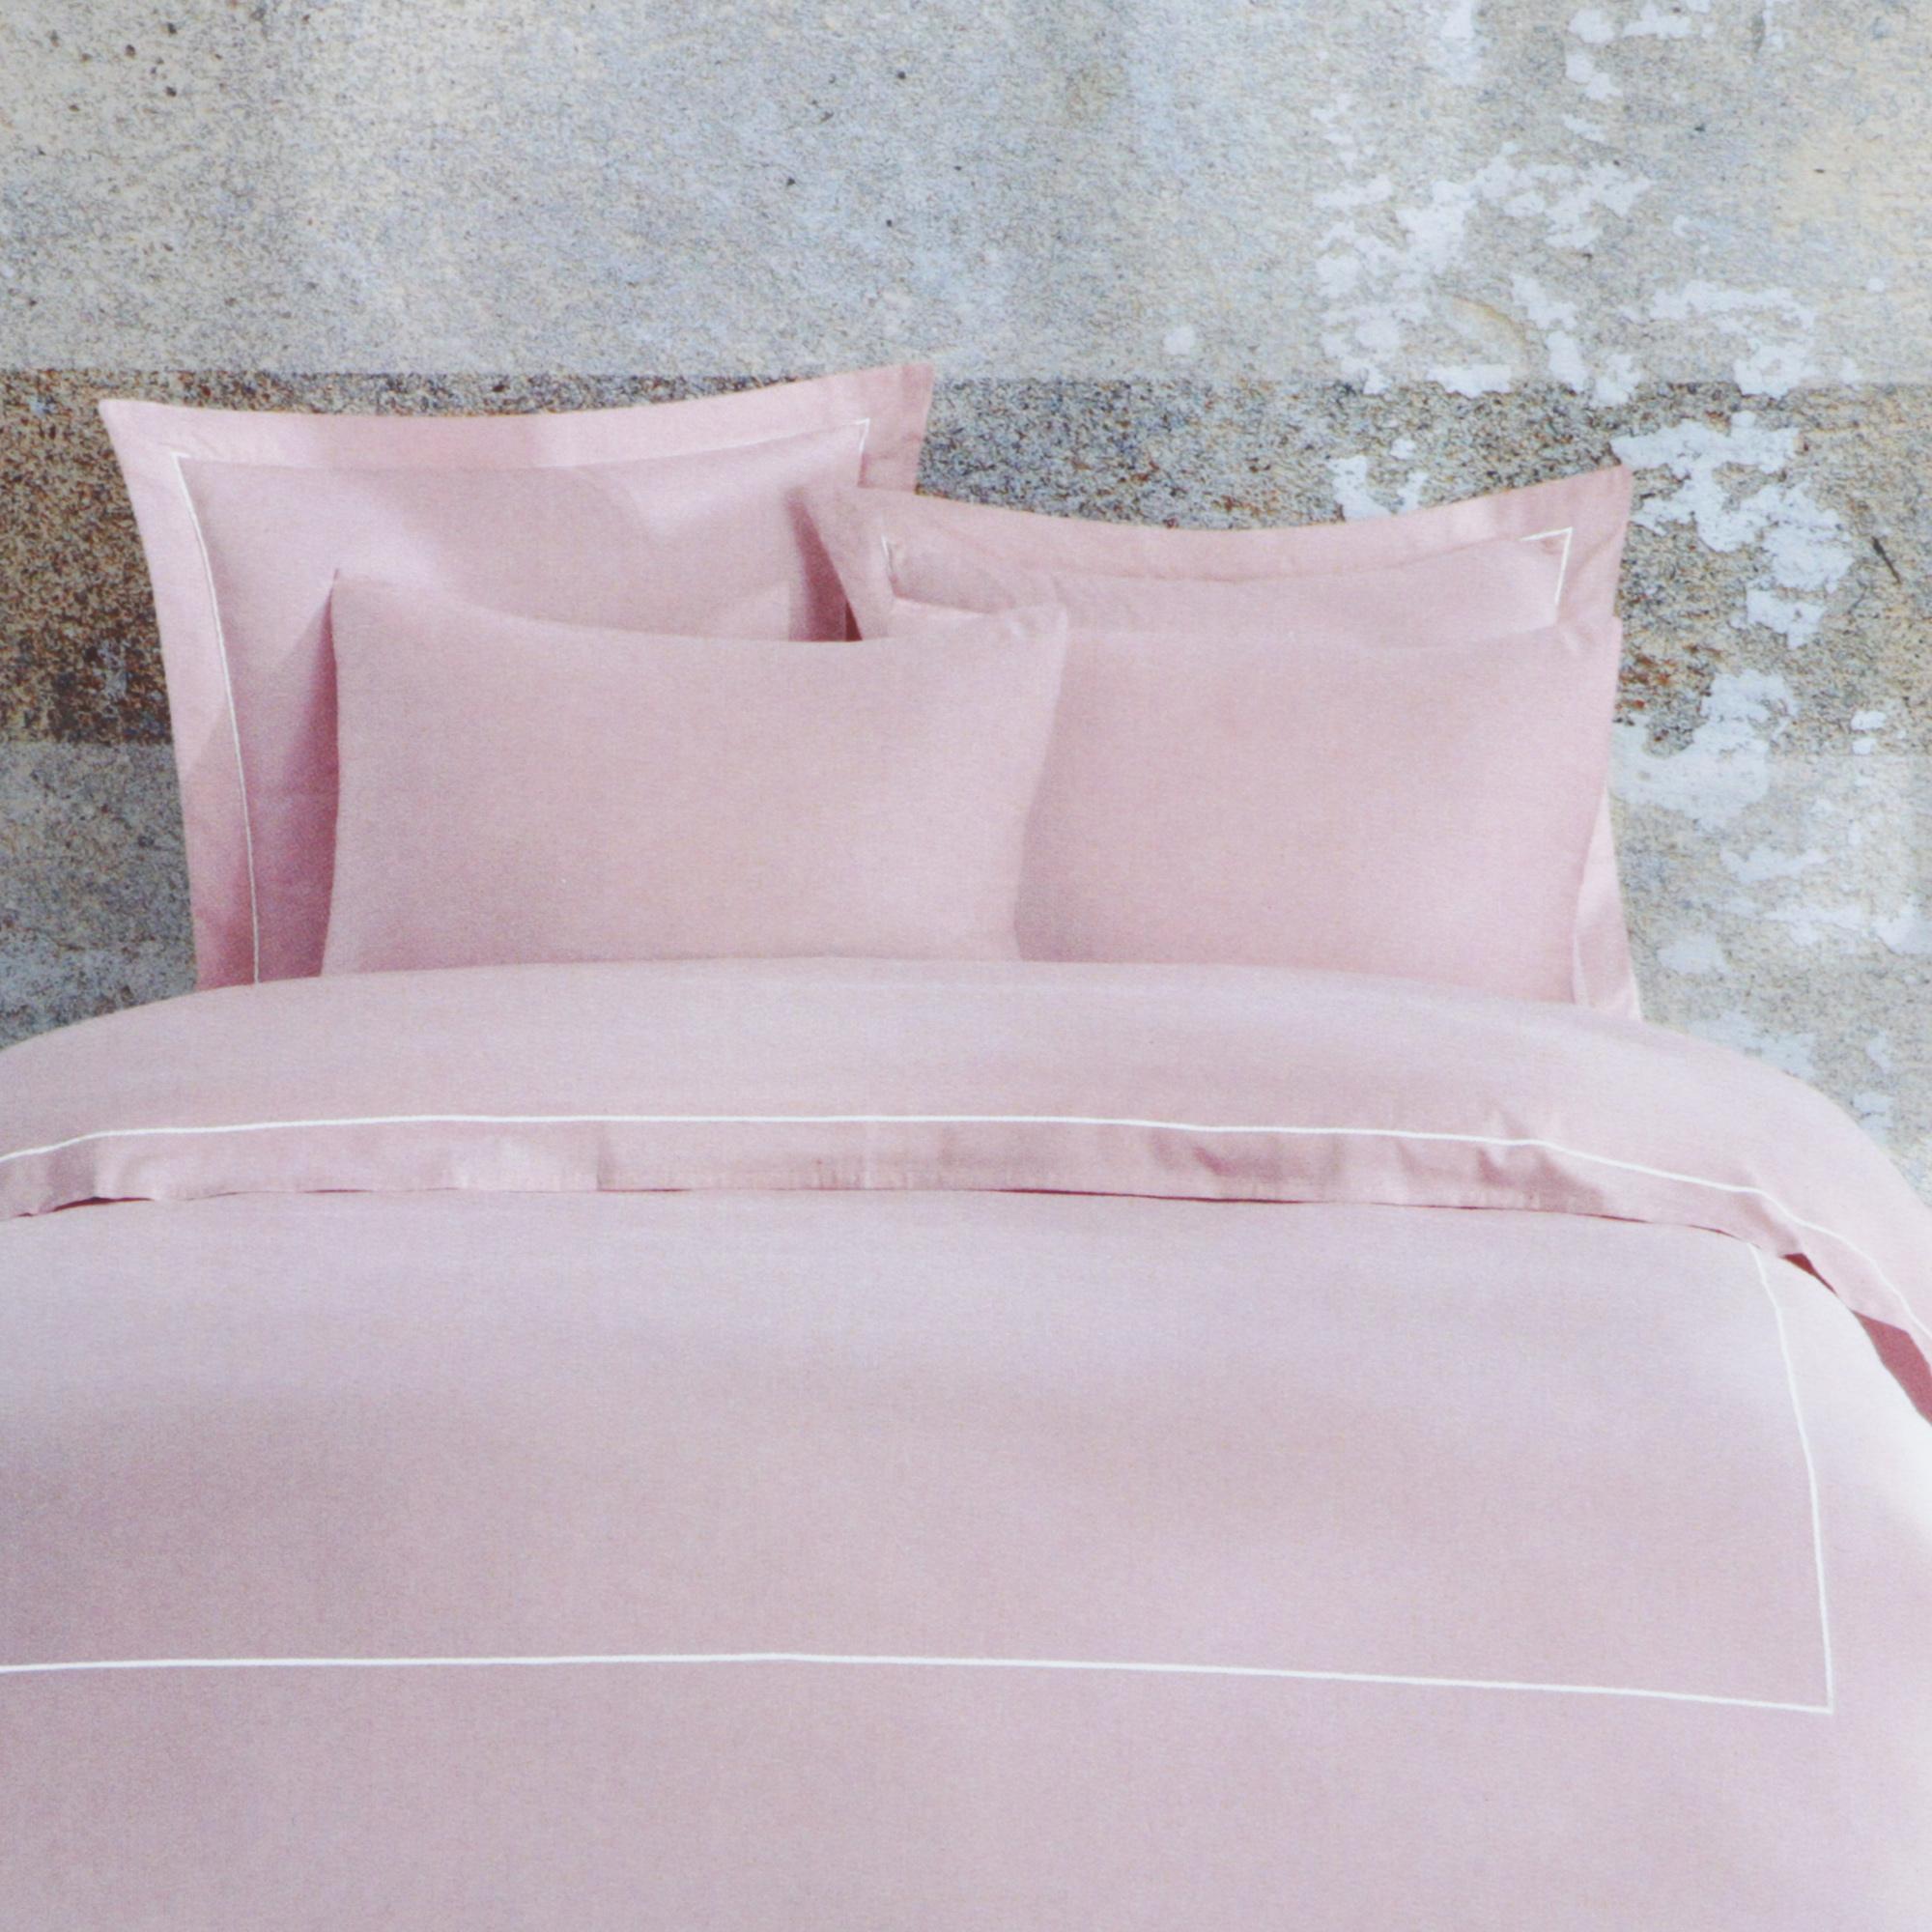 Постельный комплект Bella casa king size chinte rose /white stripes постельный комплект bella casa 1 5сп white golden olive stripes